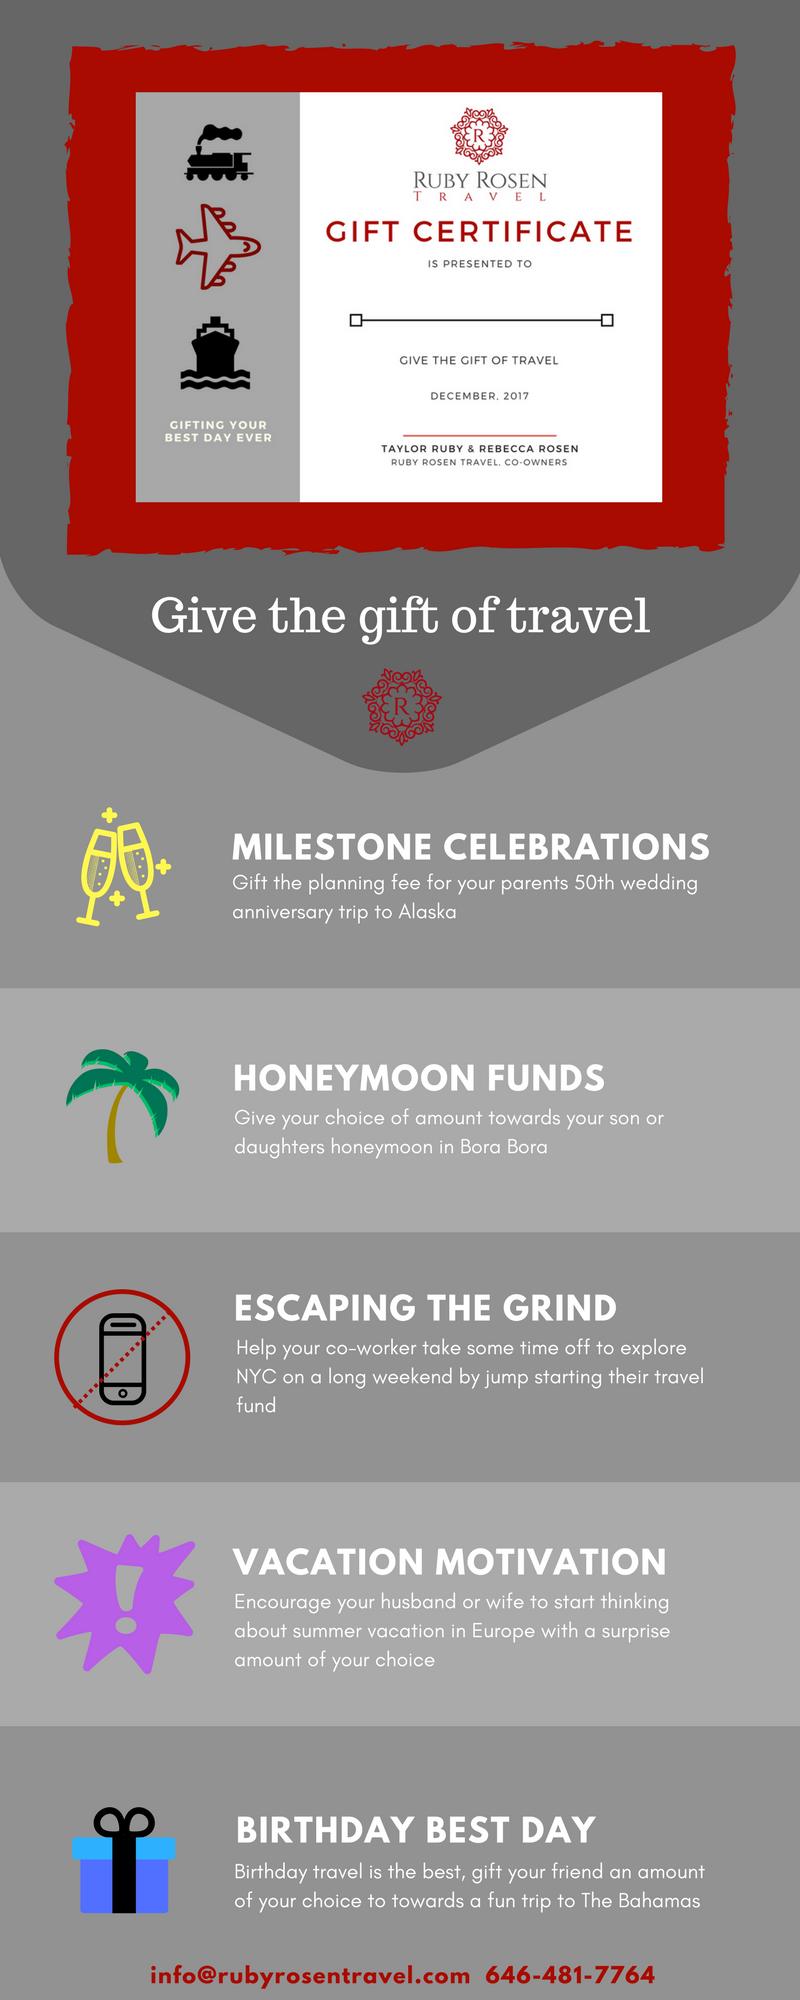 Ruby Rosen Travel Gift Certificate.png